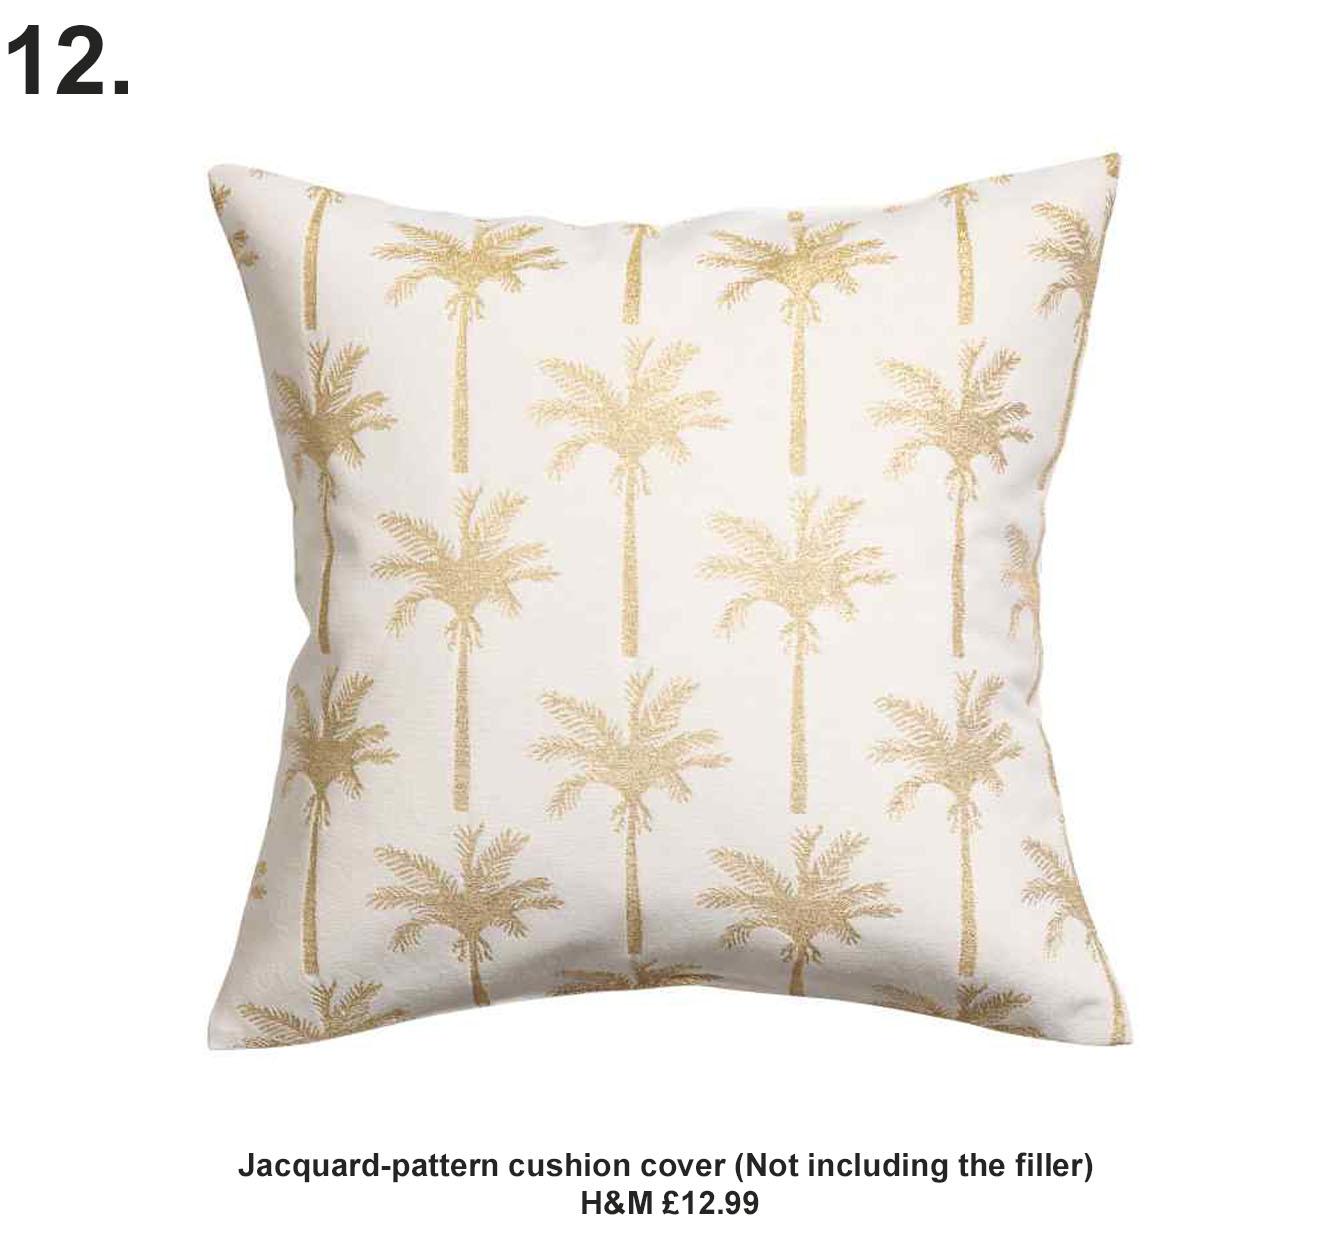 Jacquard-pattern cushion cover H&M £12.99